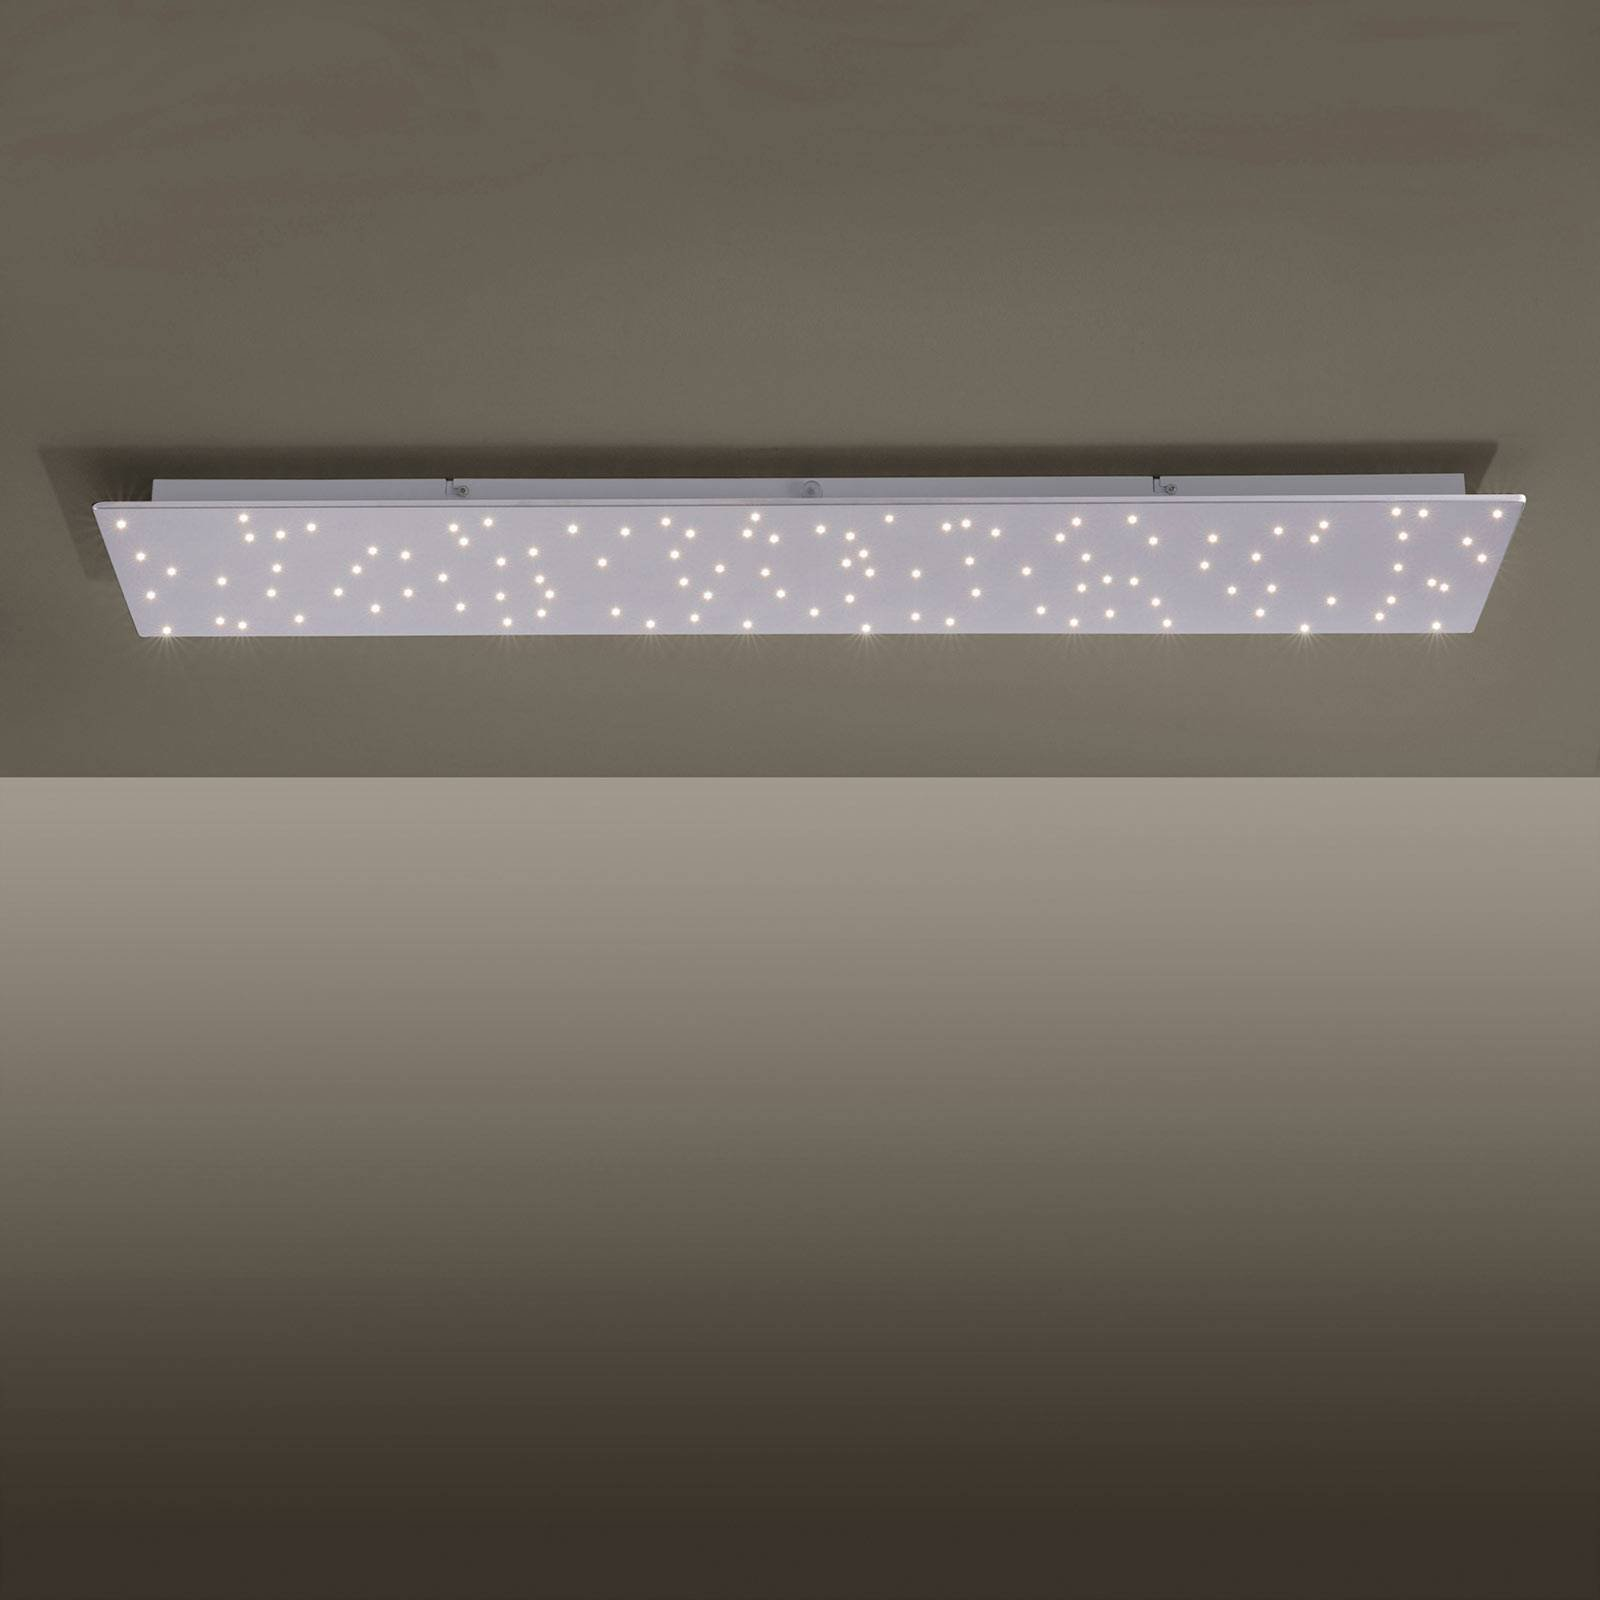 Sparkle LED-taklampe, tunable white, 100 x 25 cm